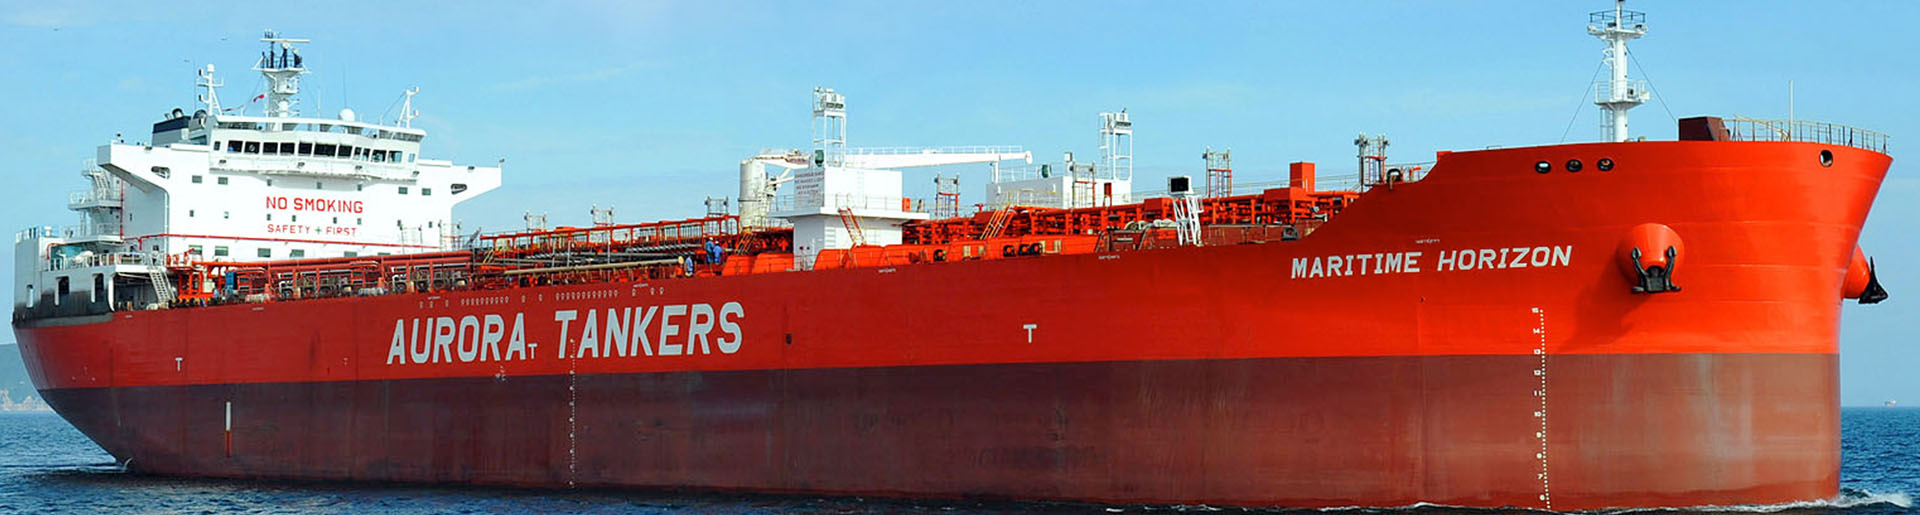 Aurora Tankers